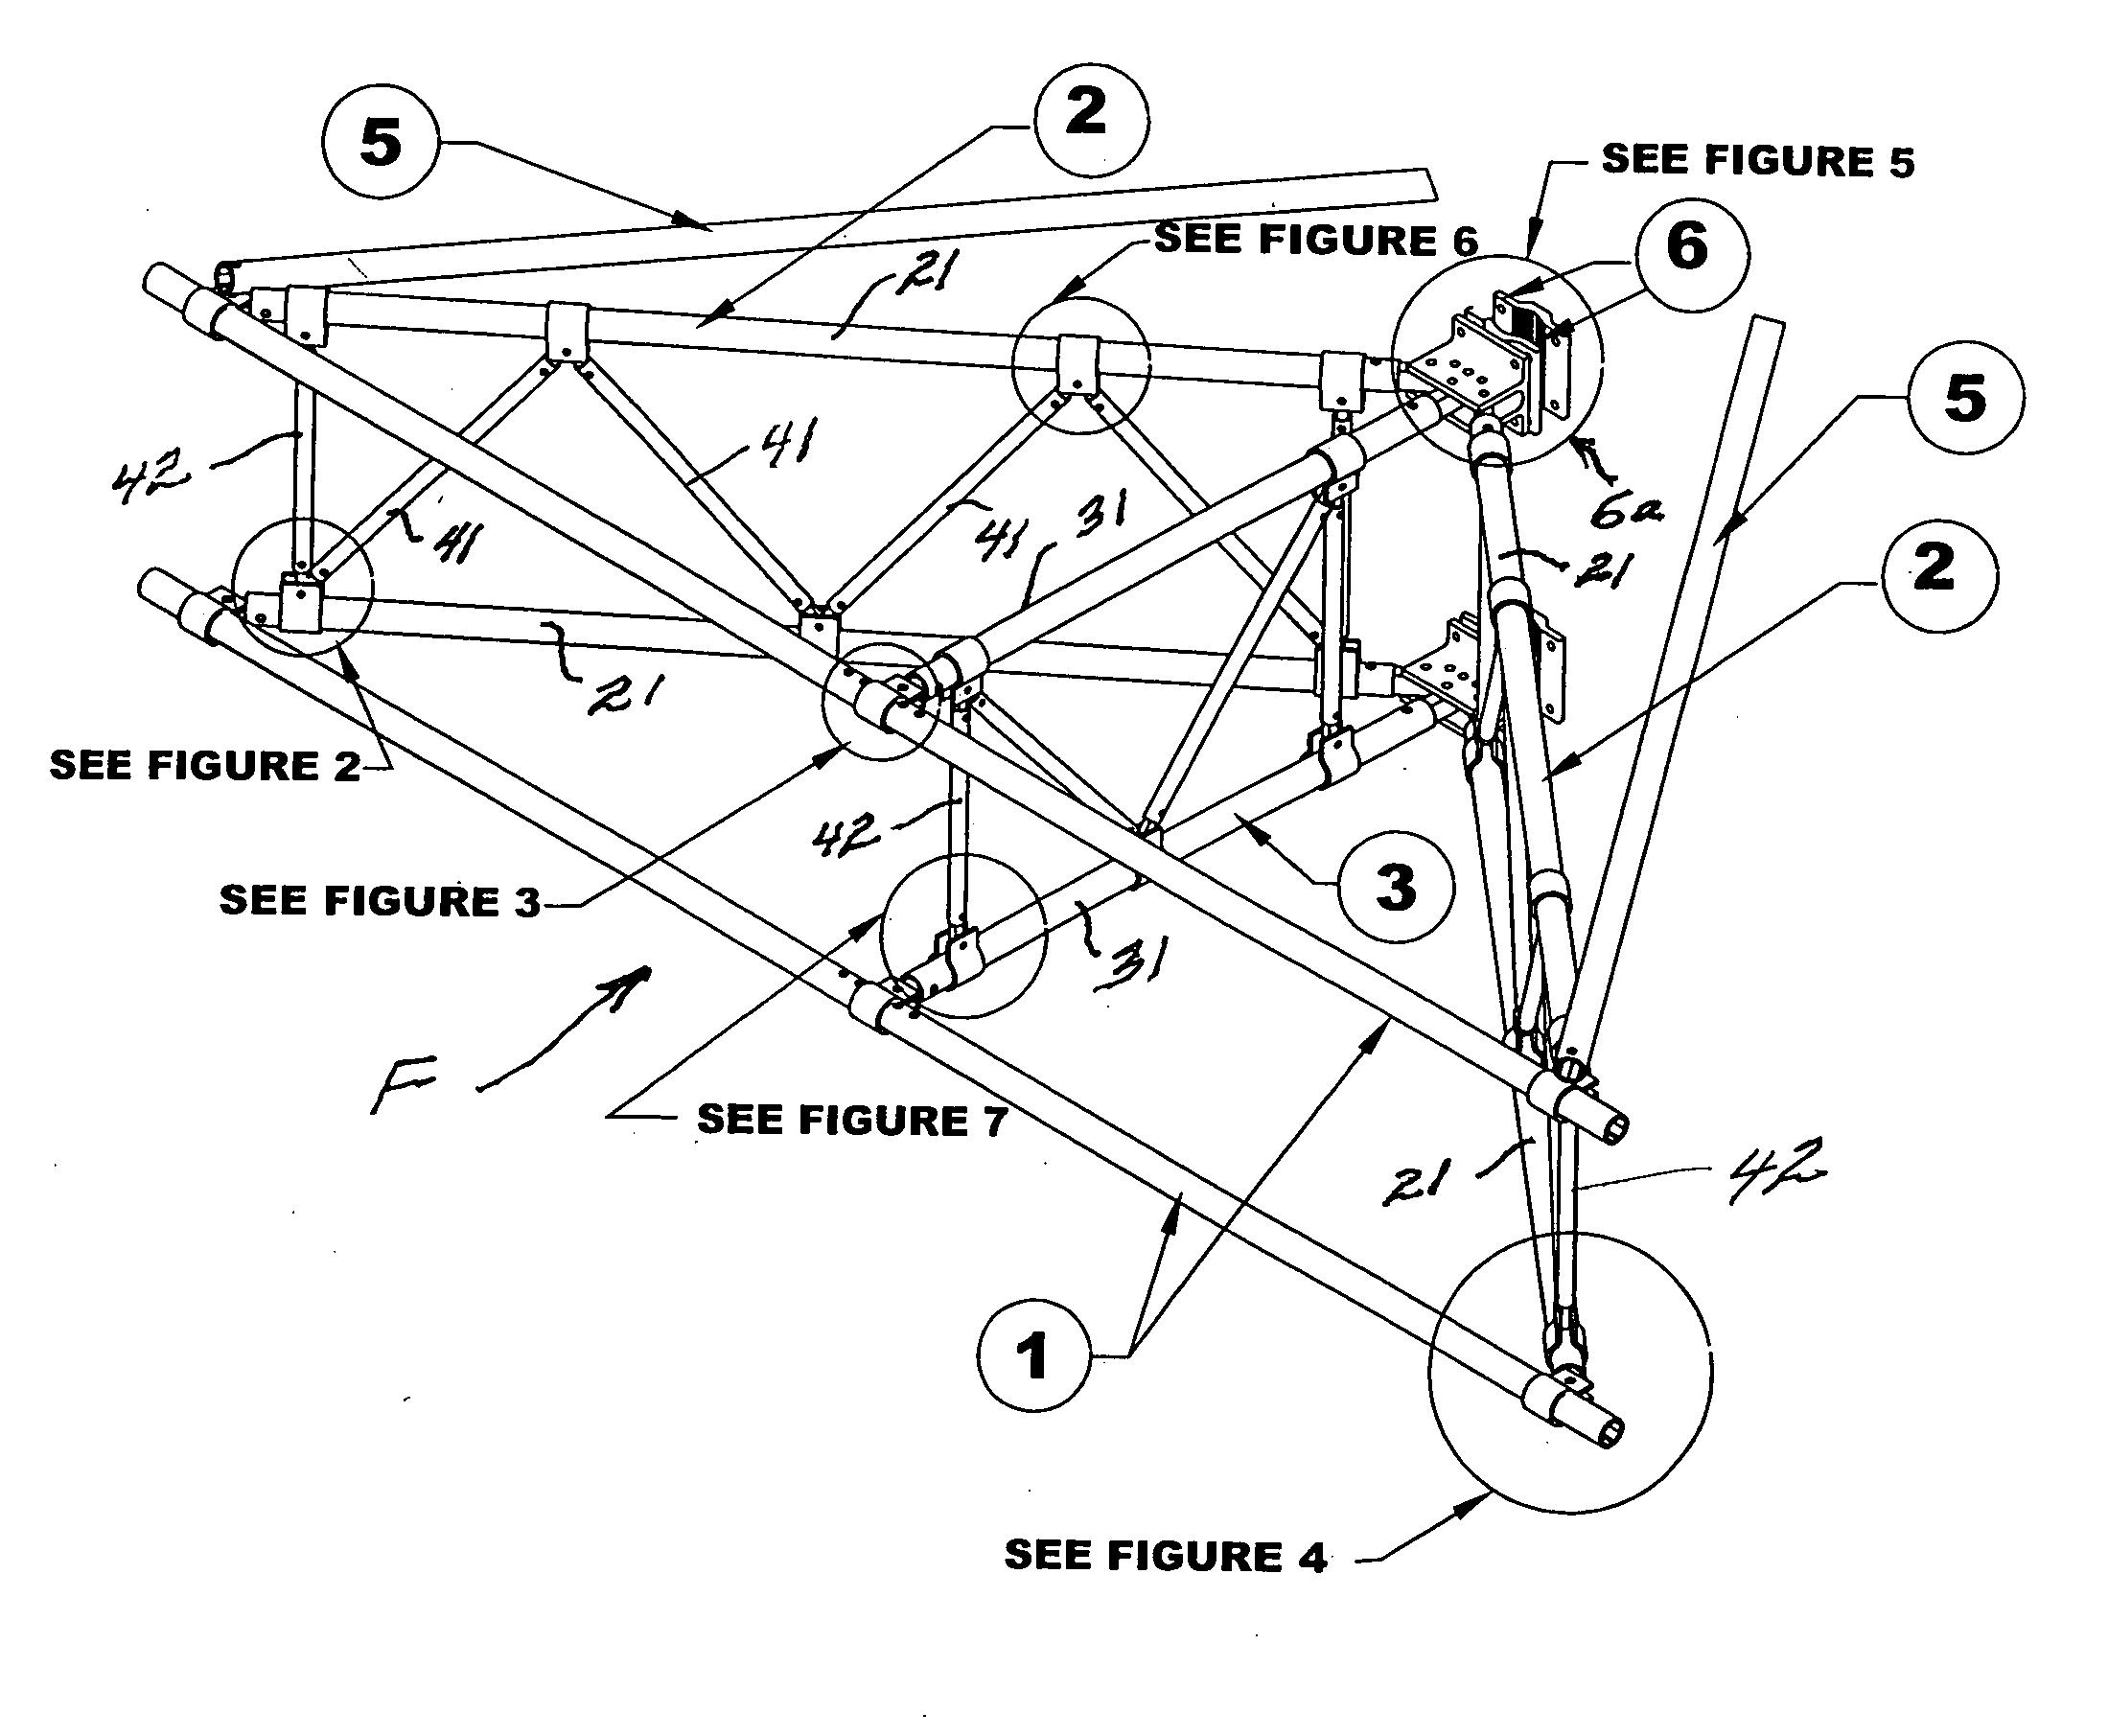 1996 Ford Mustang Belt Diagram Html Com